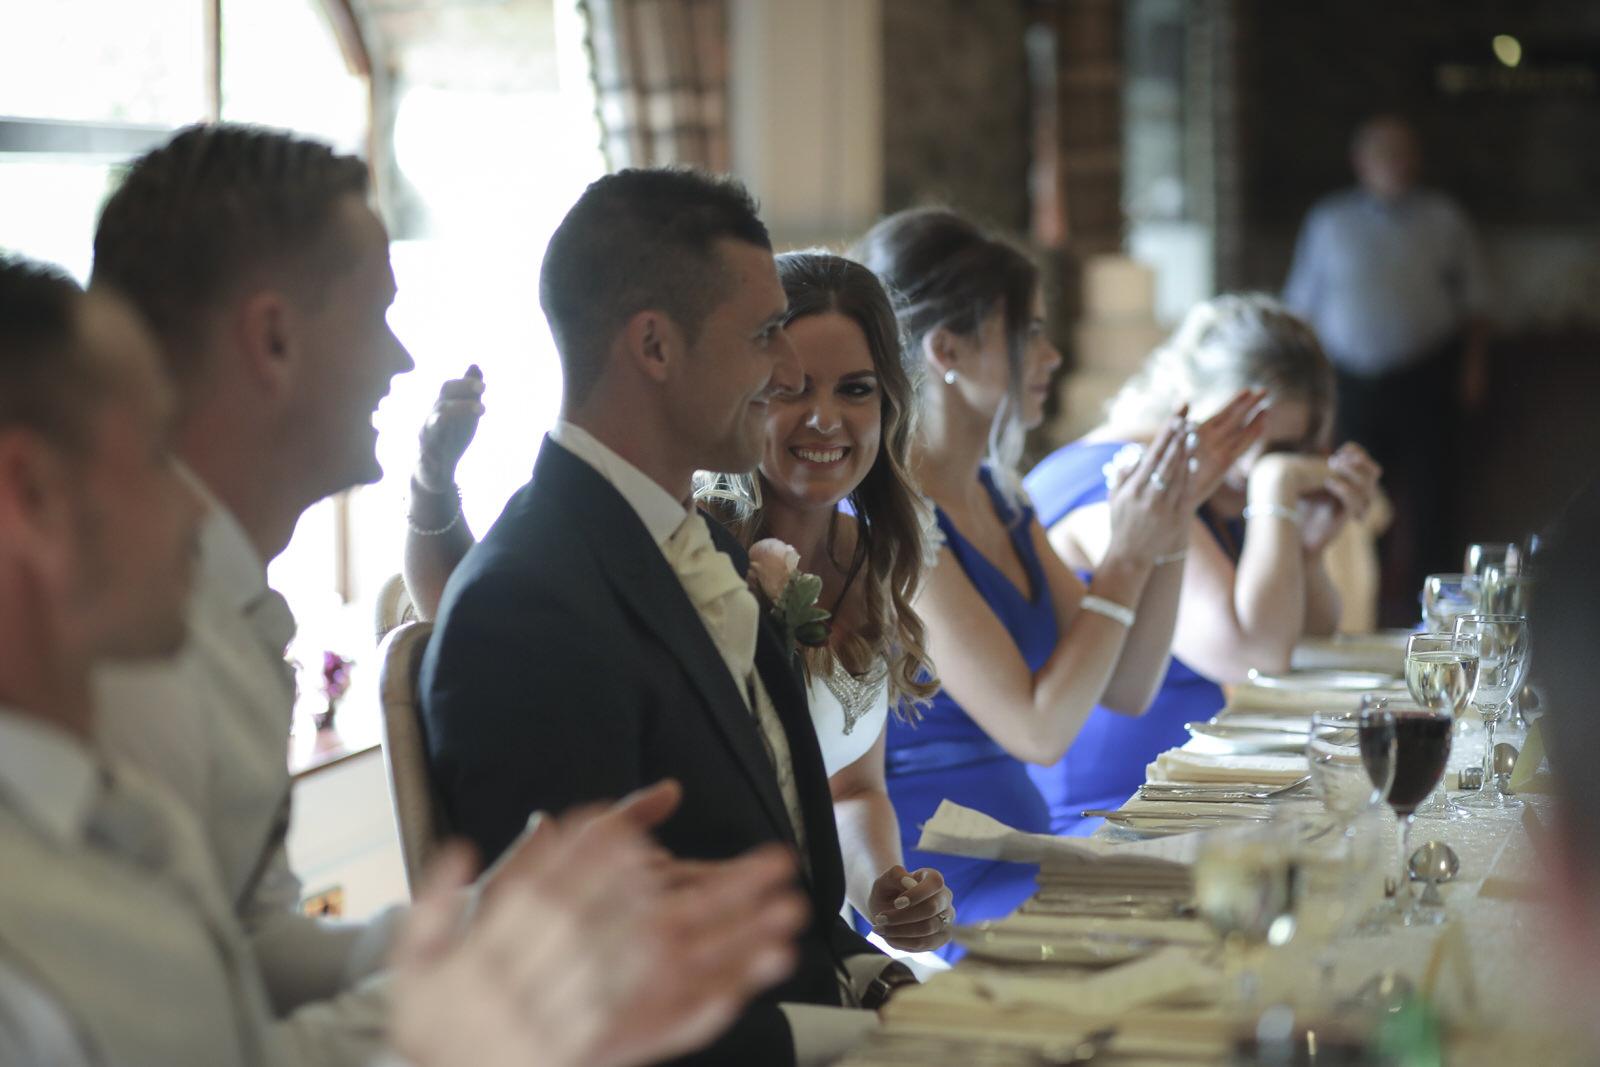 darver_castle_wedding_photographer_goldenmonentsweddingphotography_a279.jpg